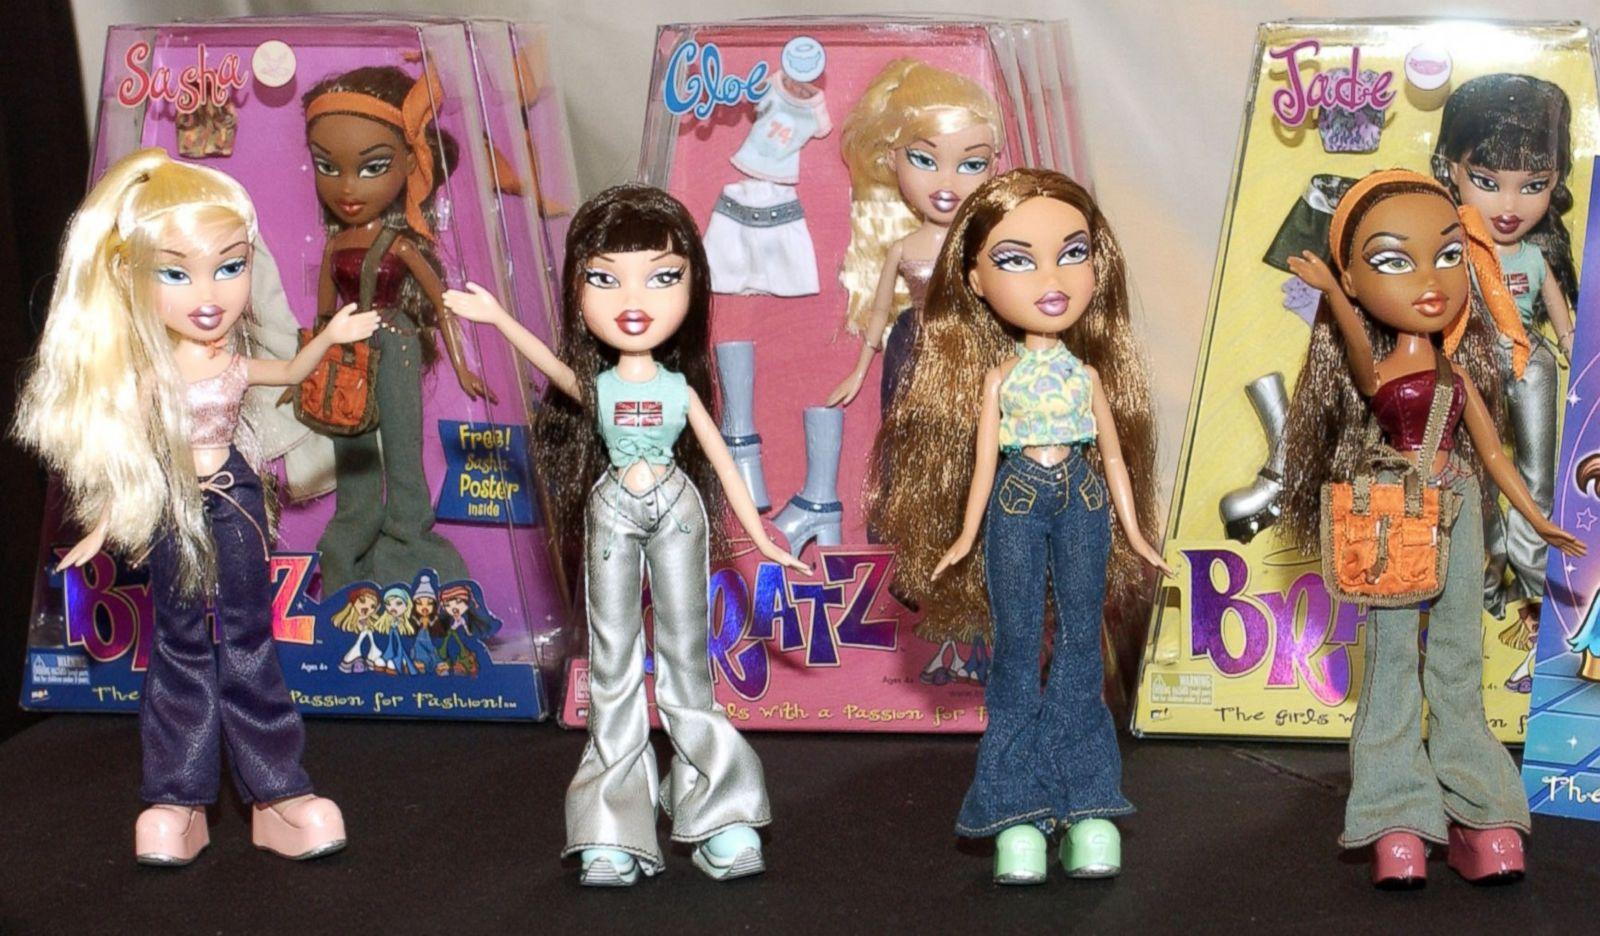 ht_toy_year_2001_bratz_dolls_mga_entertainment_jc_150212_12x7_1600.jpg